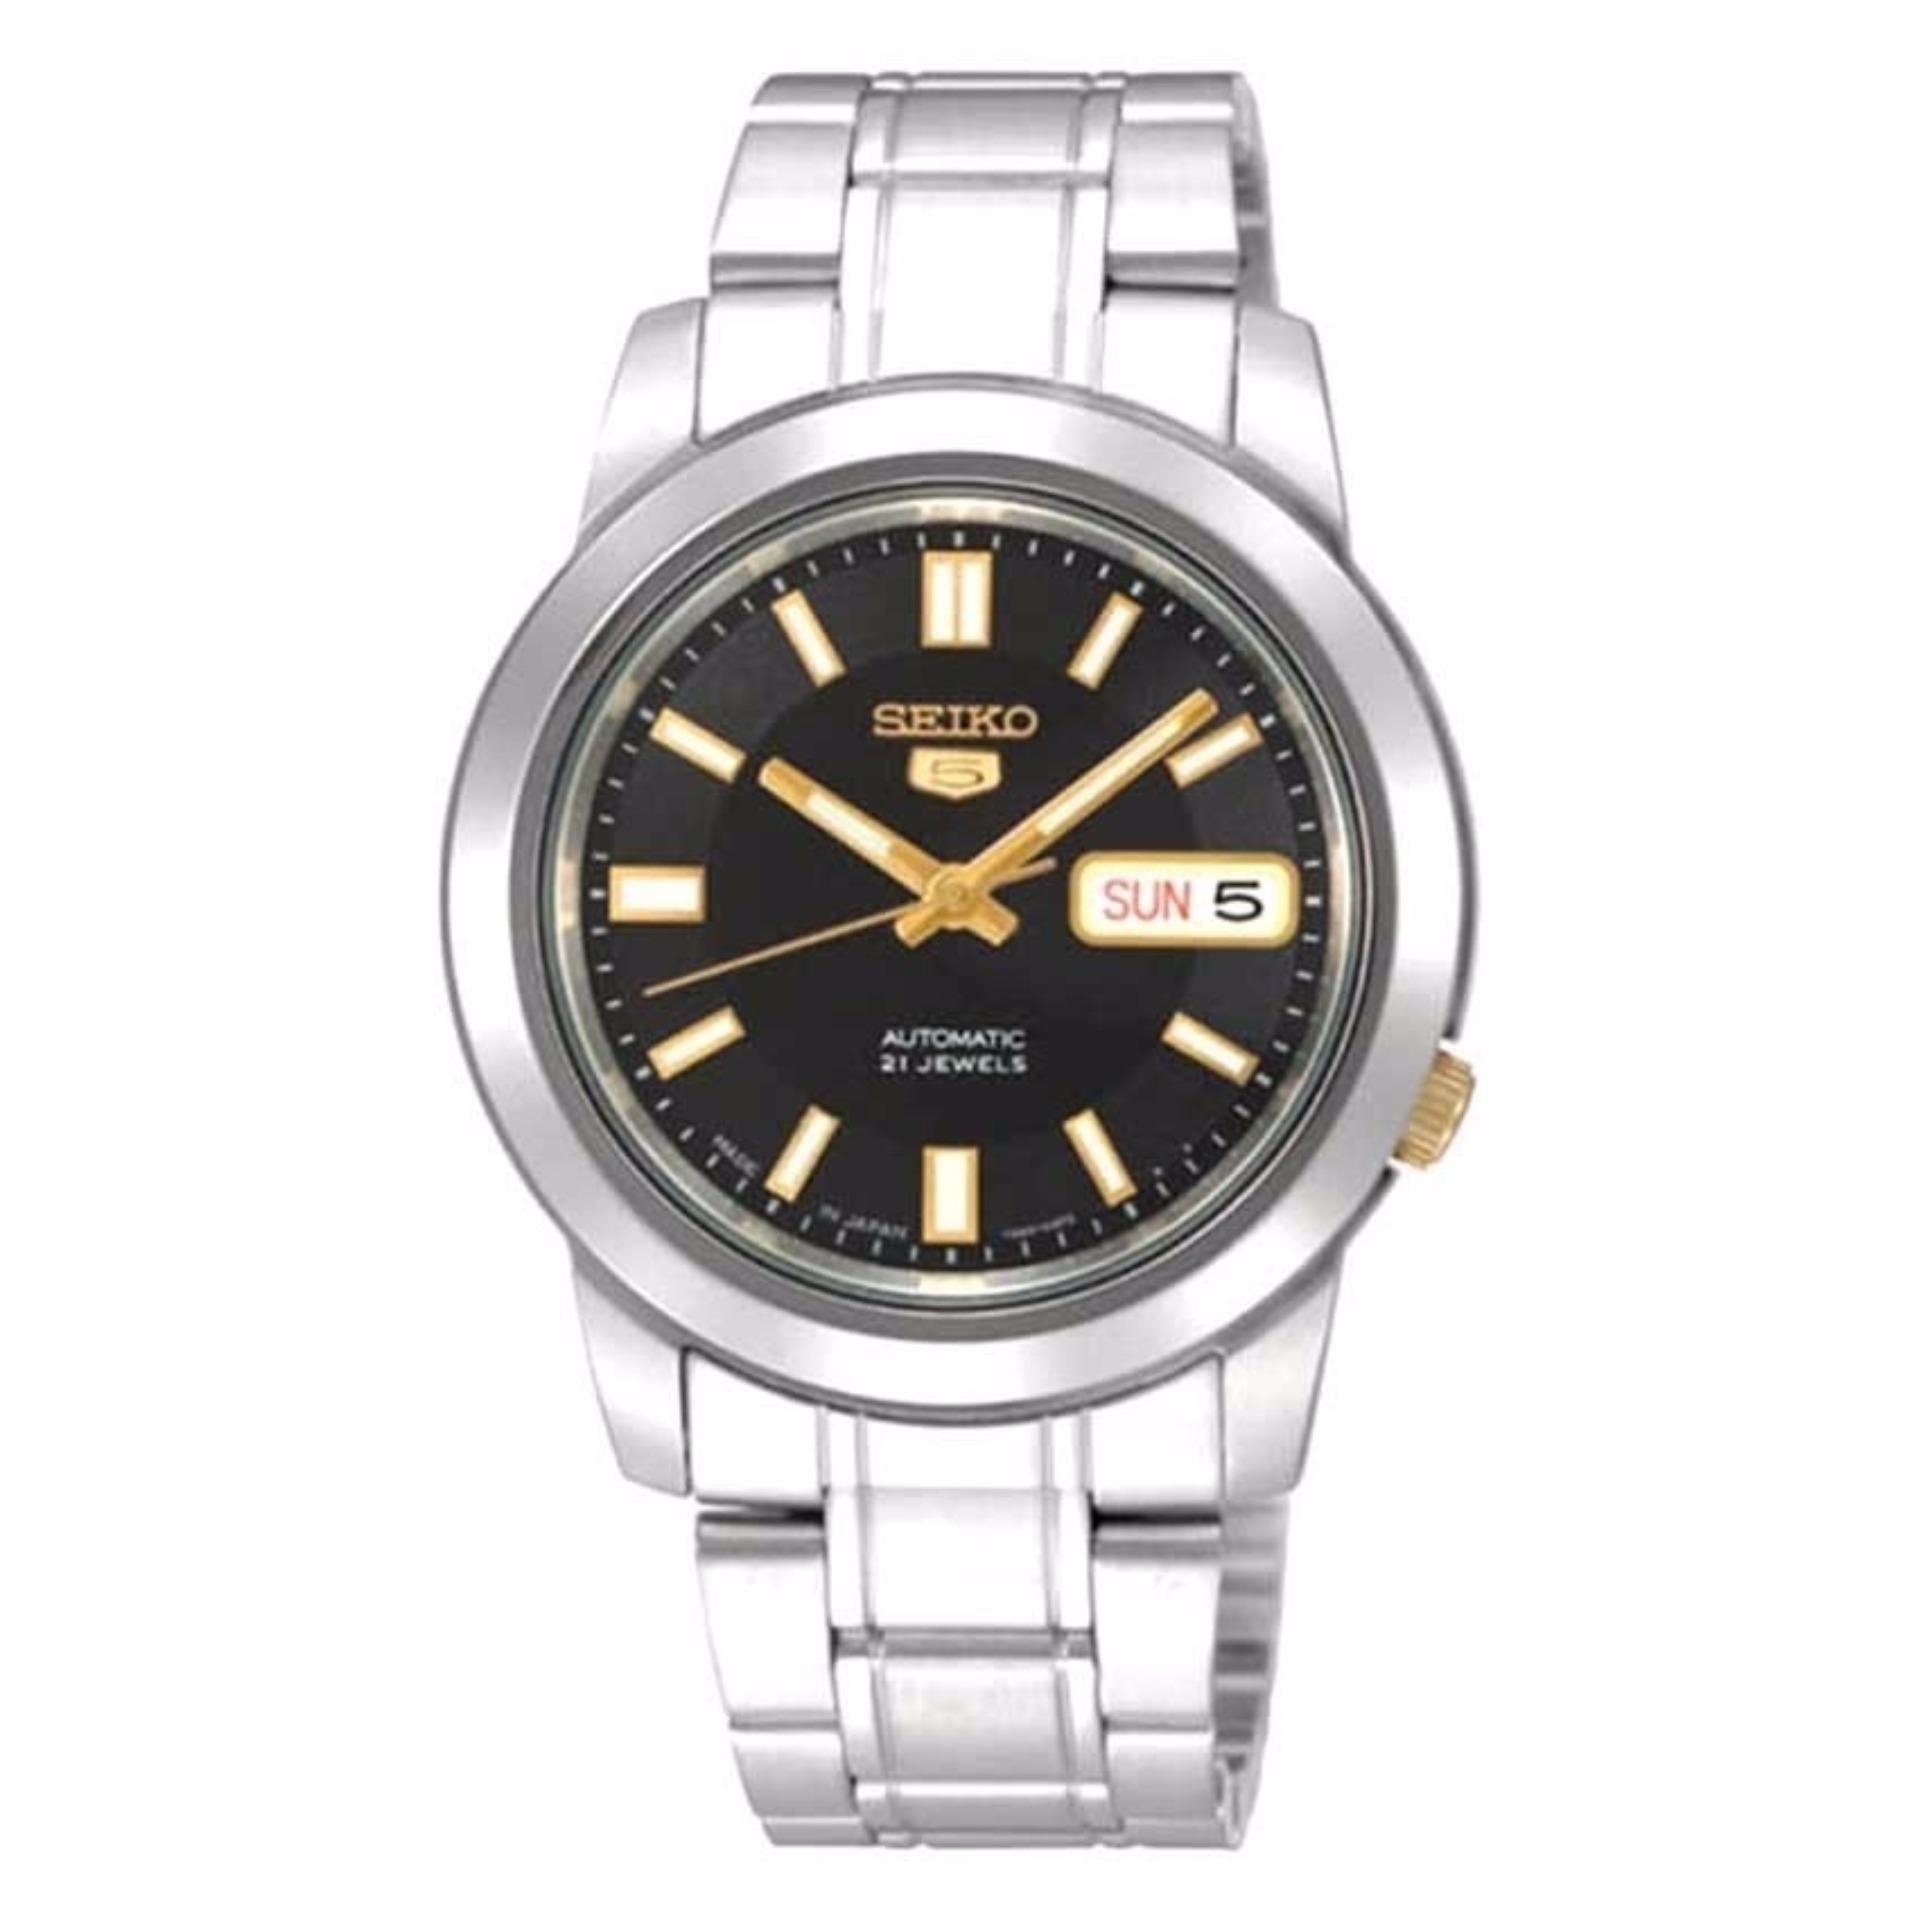 Sale Seiko 5 Snkk17K1 Snkk17K Snkk17 Automatic Stainless Steel Black Dial Analog Men Watches Seiko Branded